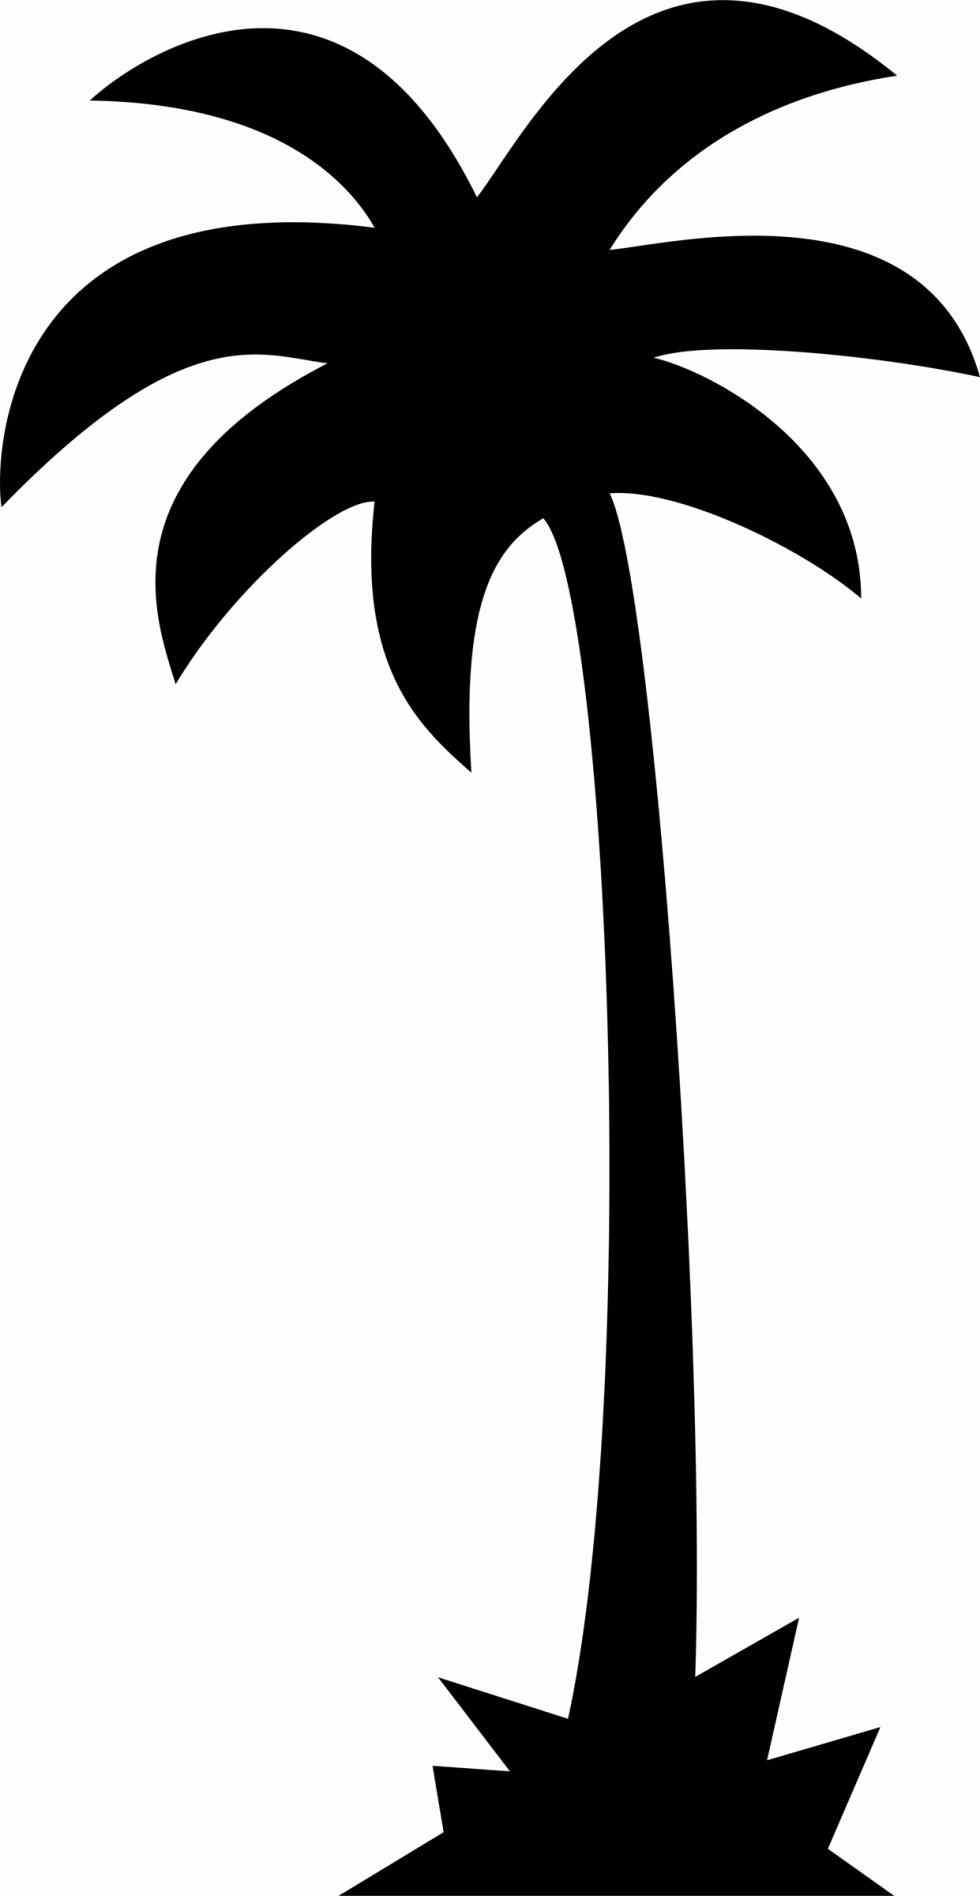 980x1896 Interior Stock Icon Simple Palm Tree Silhouette Illustration